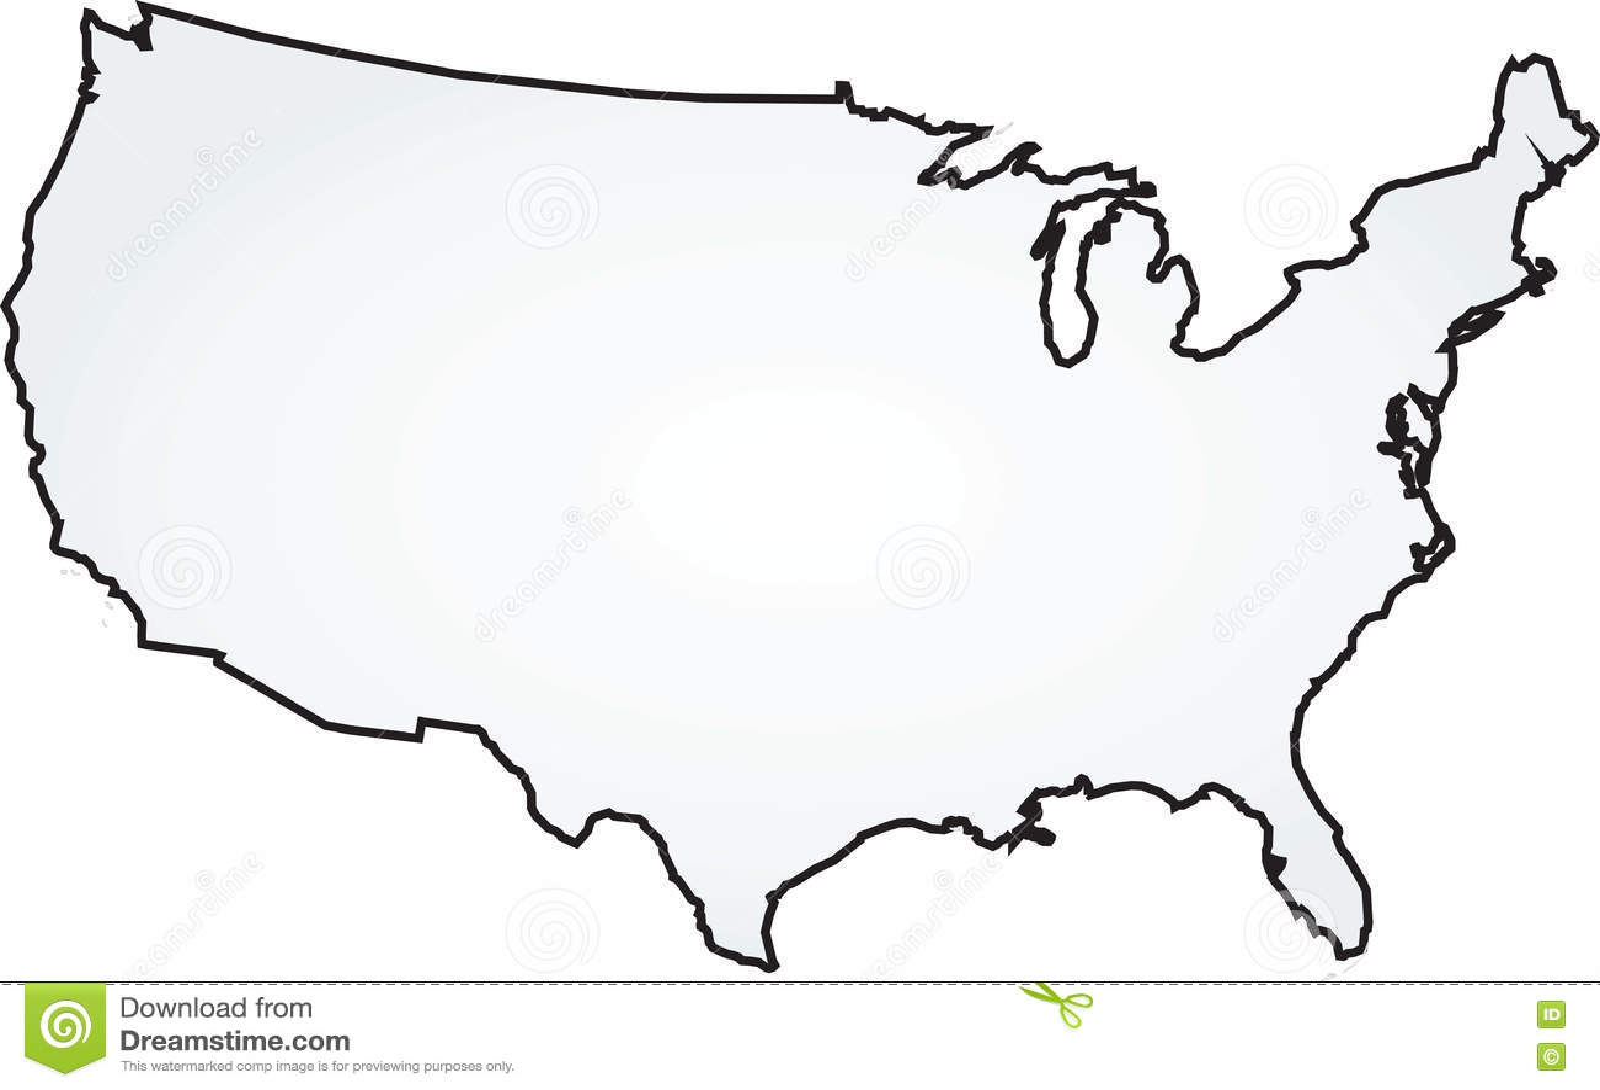 Usa Map Stock Vector Illustration Of Prison Border